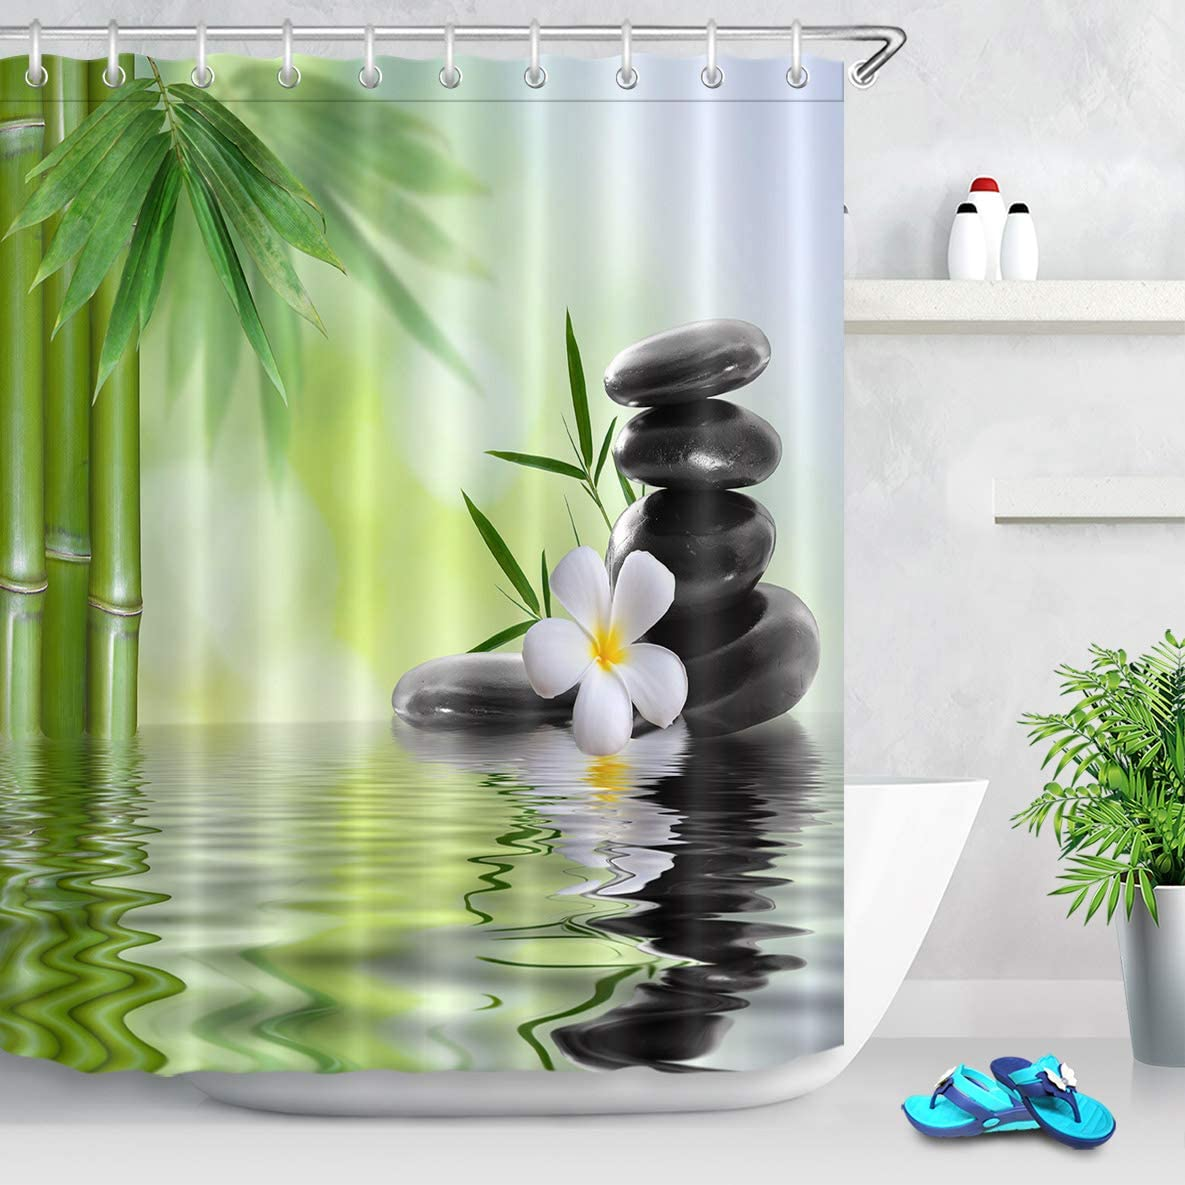 LB SPA Cortina de Ducha con Ganchos,Piedras Negras Orquídeas Bambú Cortina de baño de Agua 150W x180H CM,Tejido de poliéster Anti-Moho Resistente al Agua